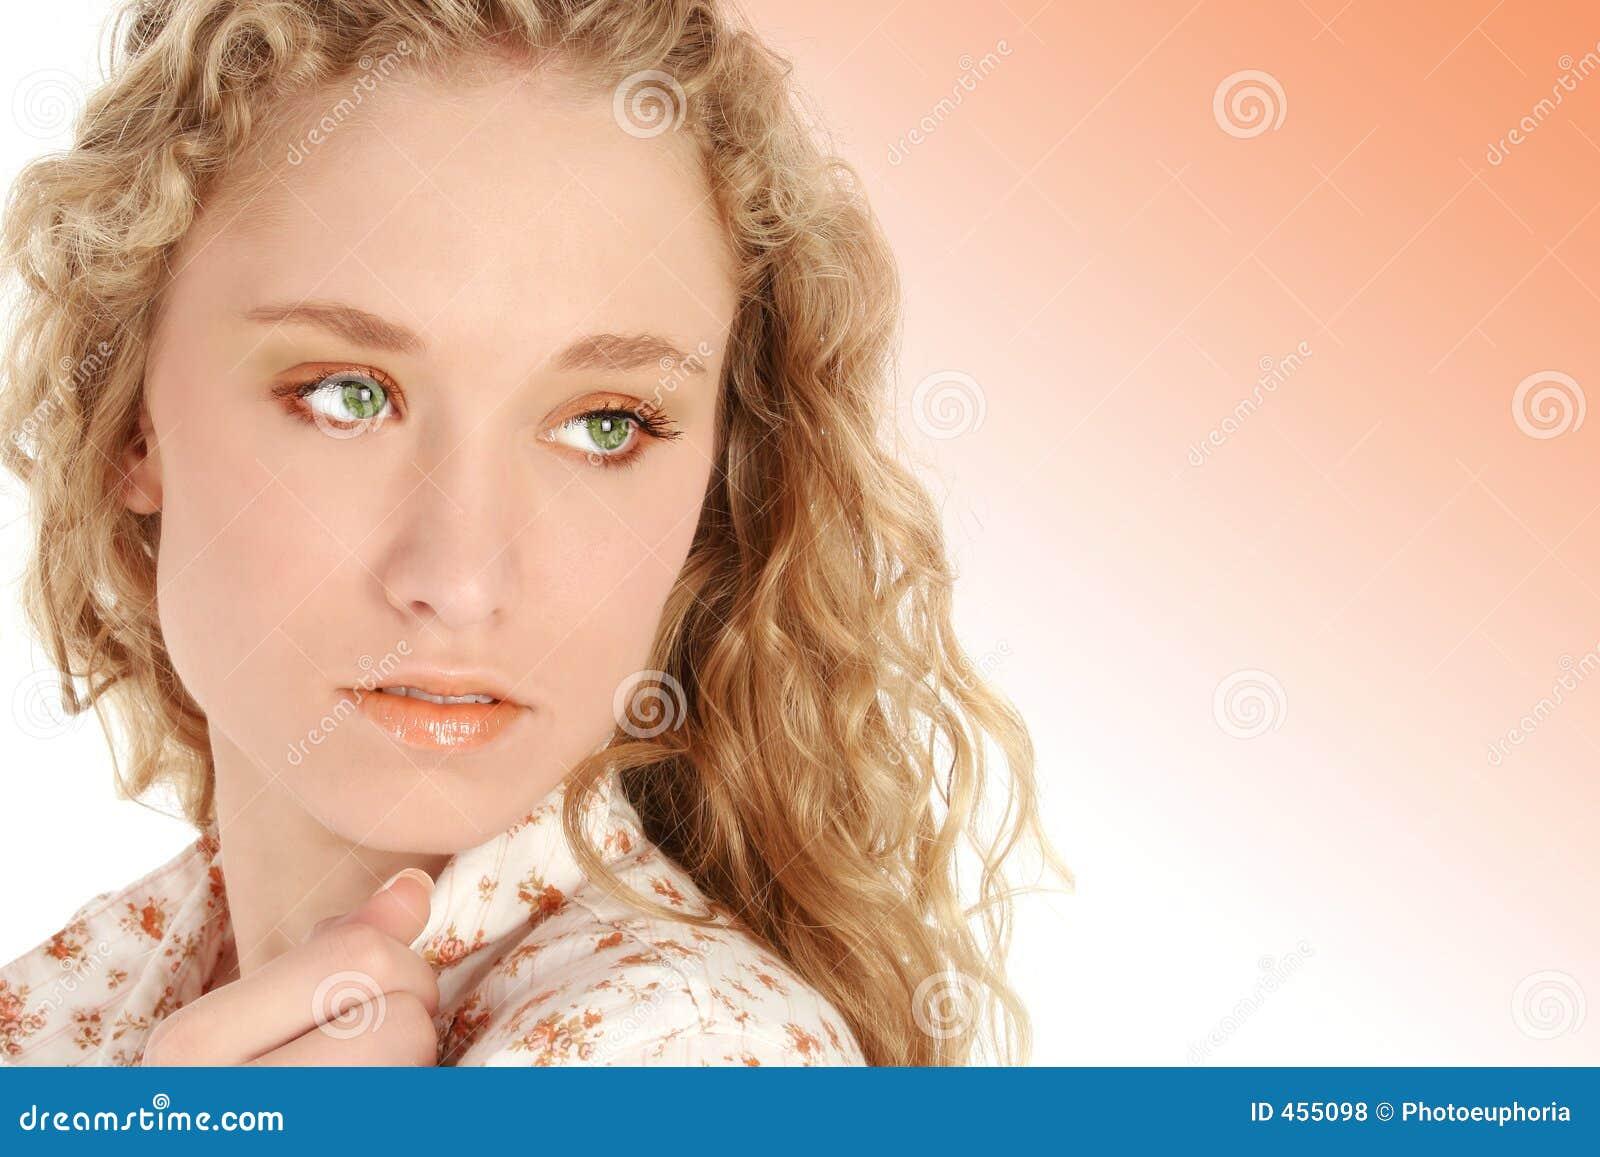 Blonde Hair Green Eyes